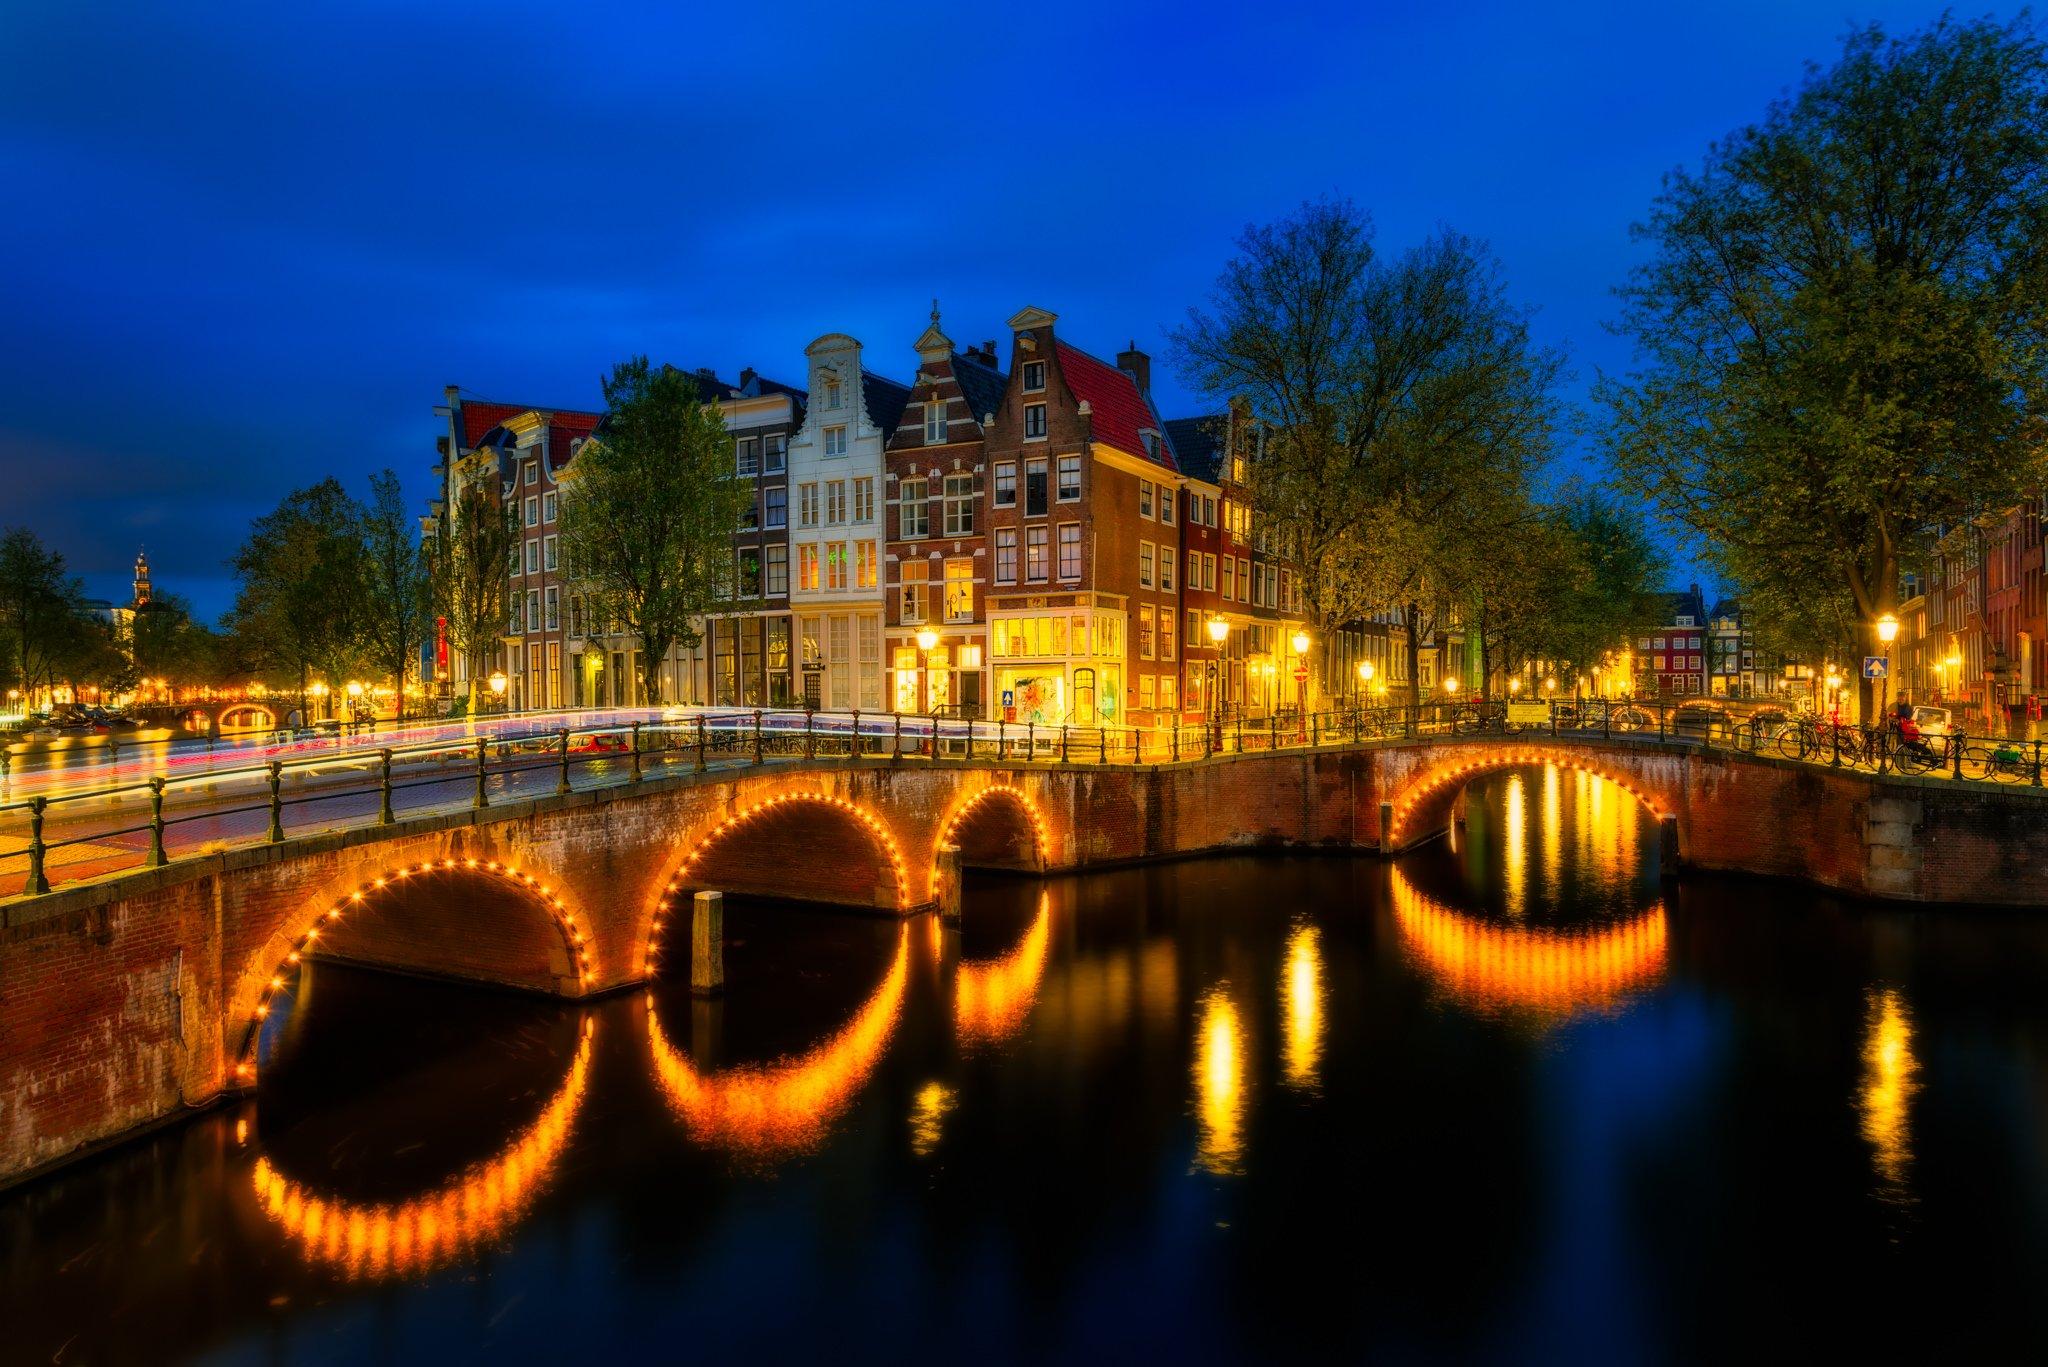 Keizersgracht | Amsterdam, Netherlands